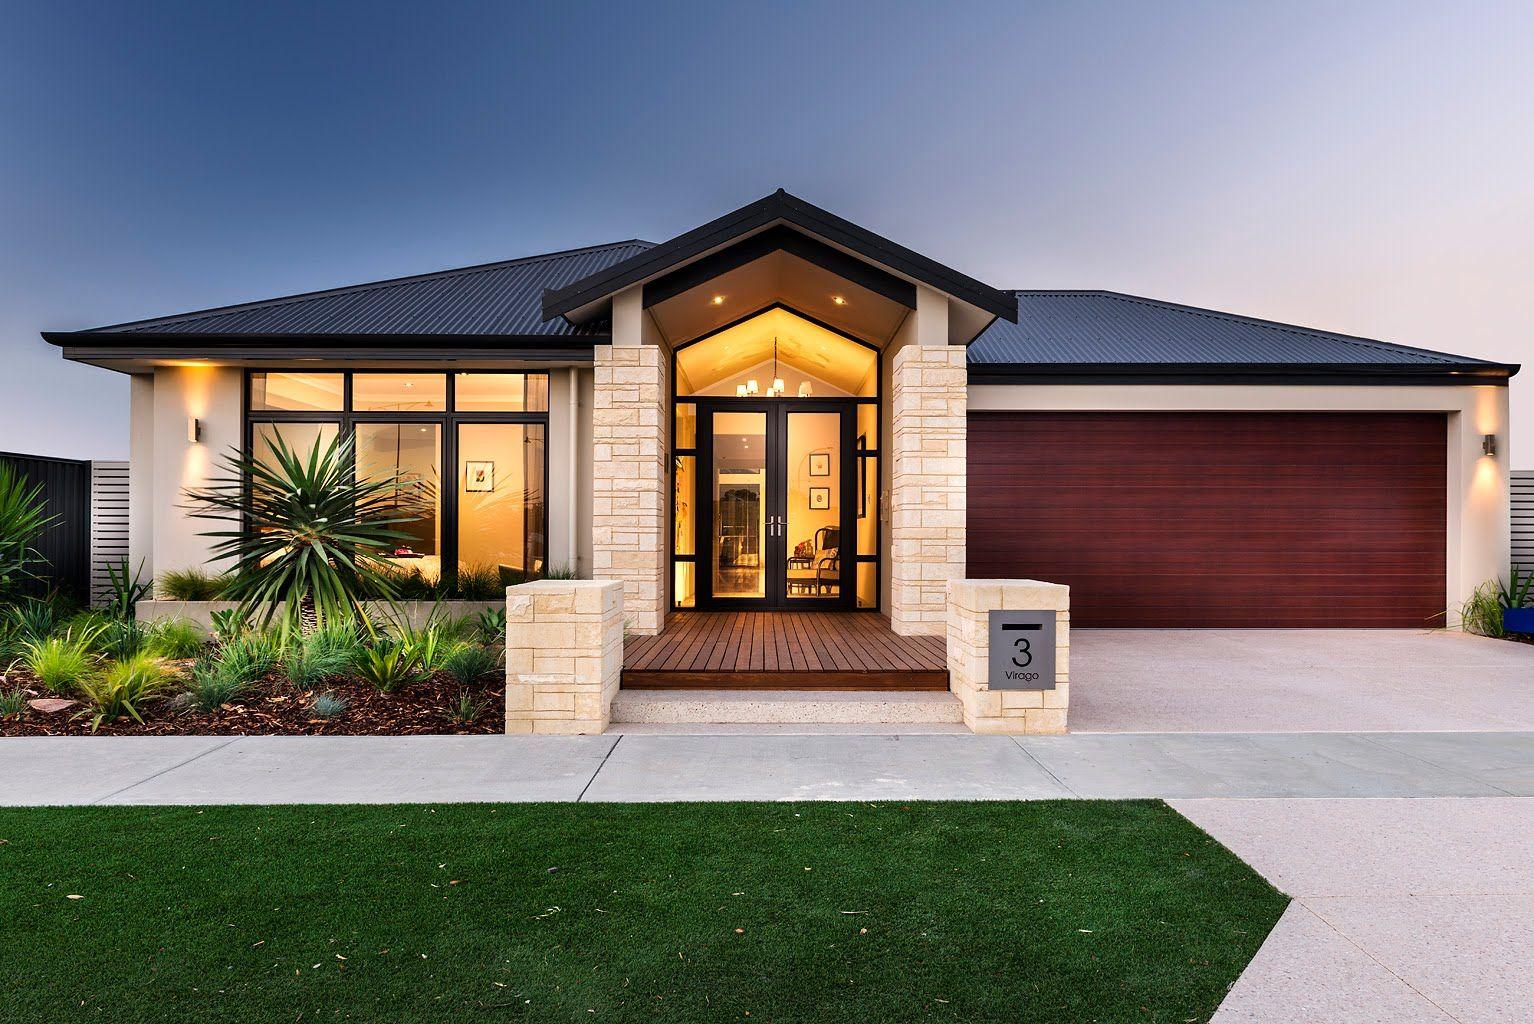 Eden - Modern Home Design Dale Alcock Homes